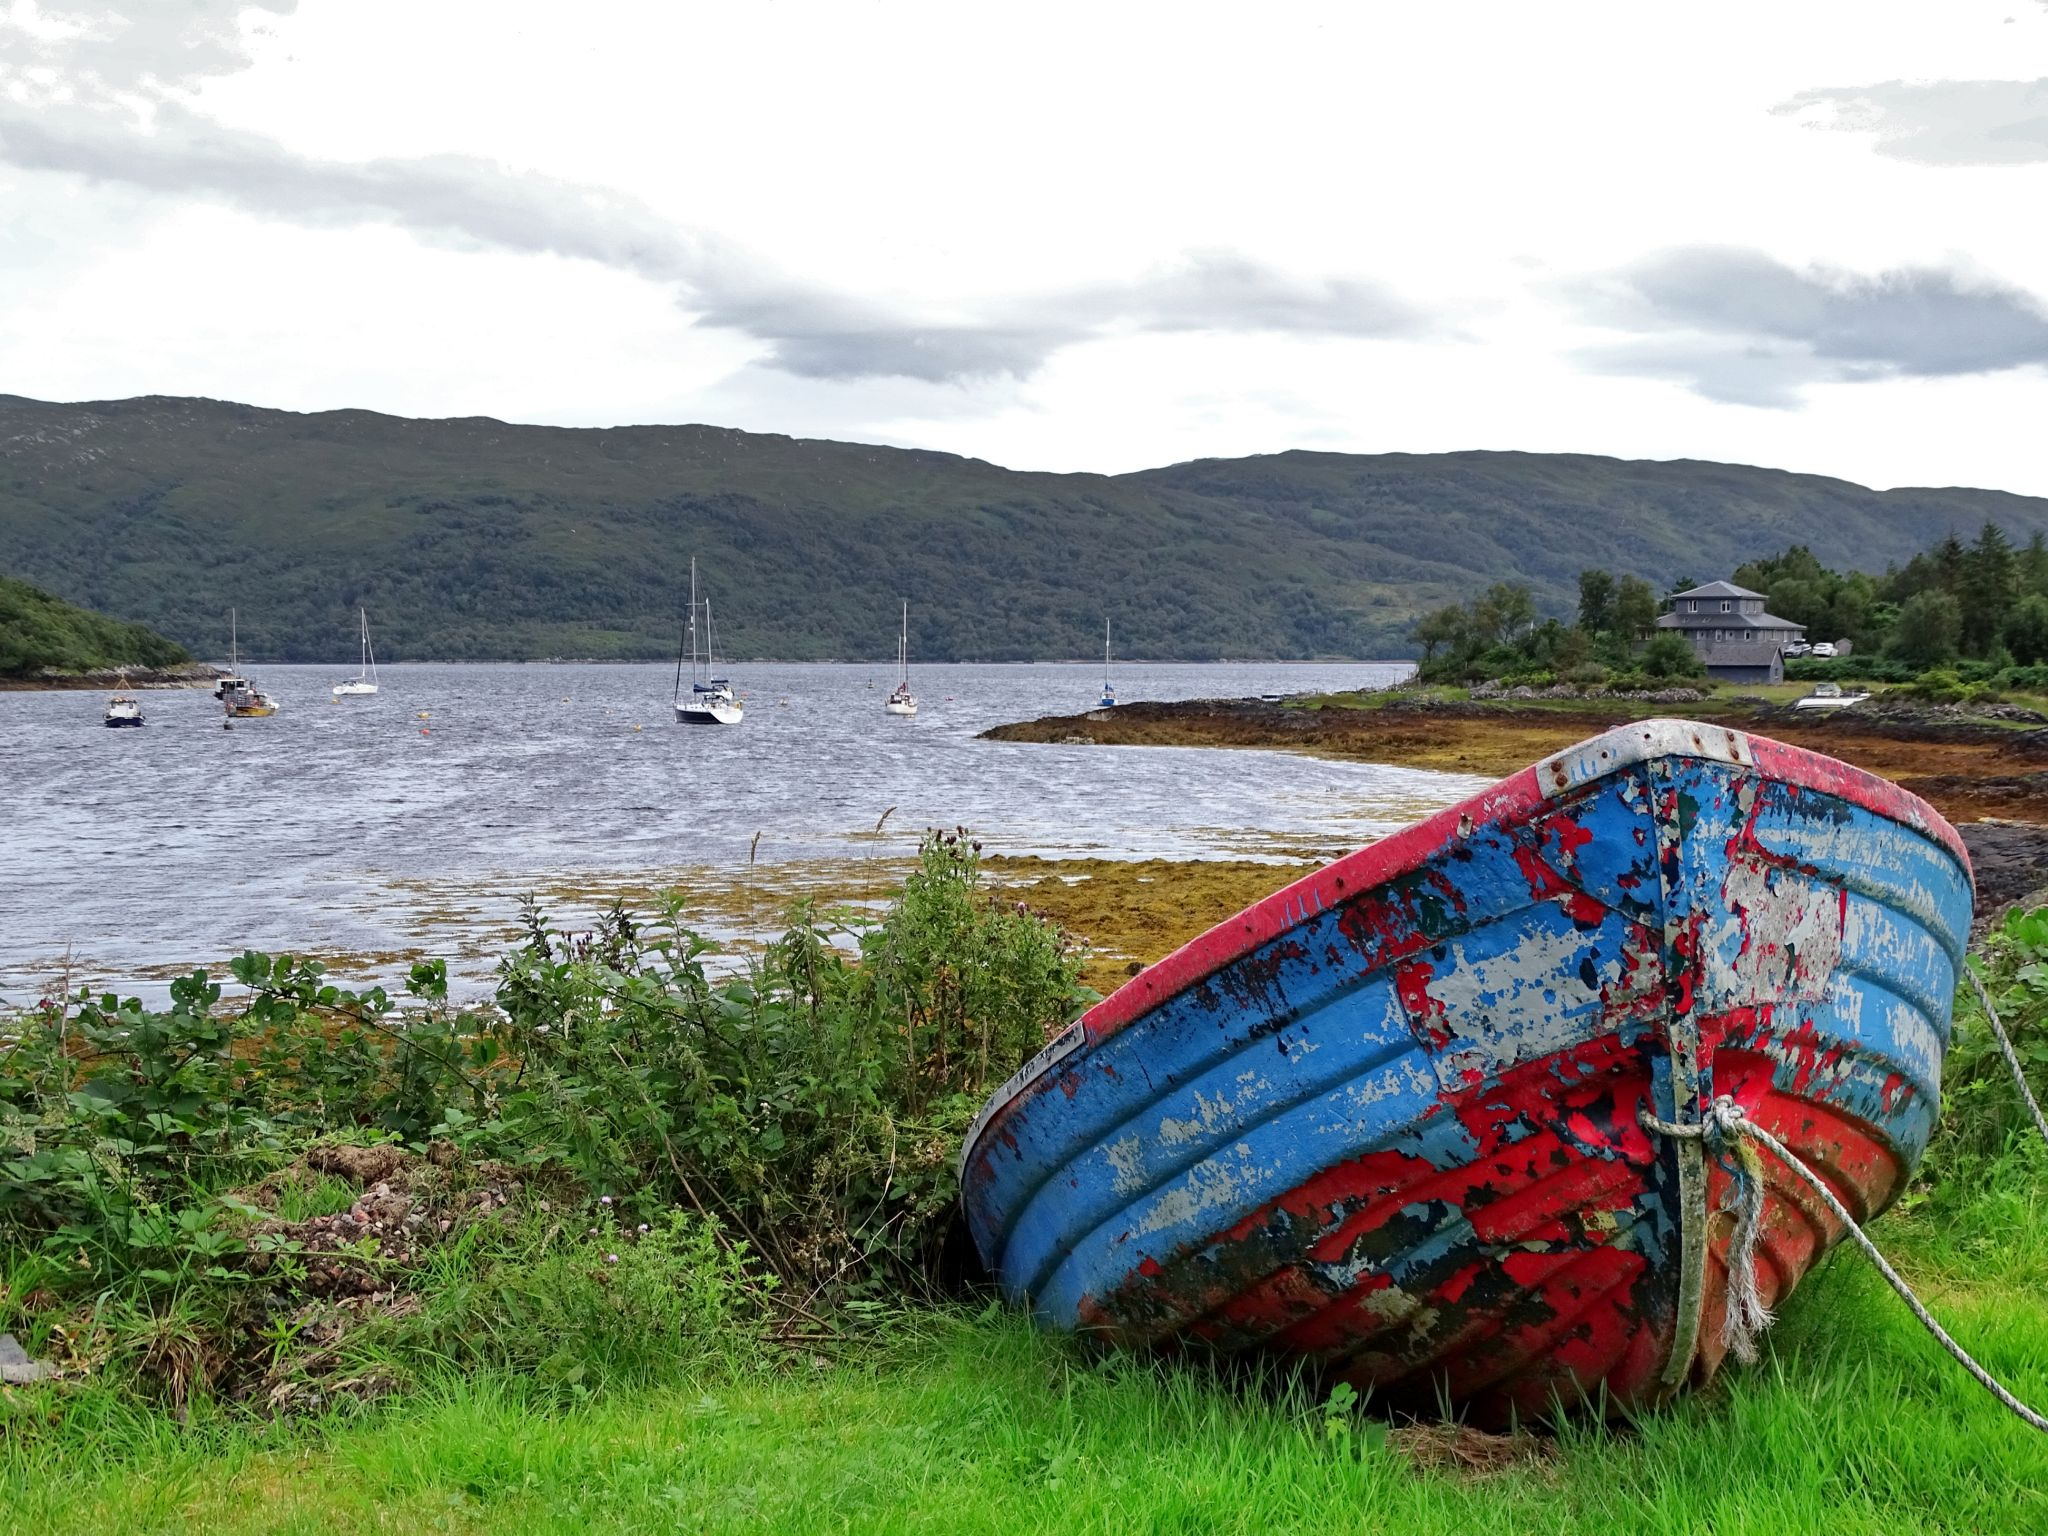 A lone boat on the Loch Sunart shore, United Kingdom